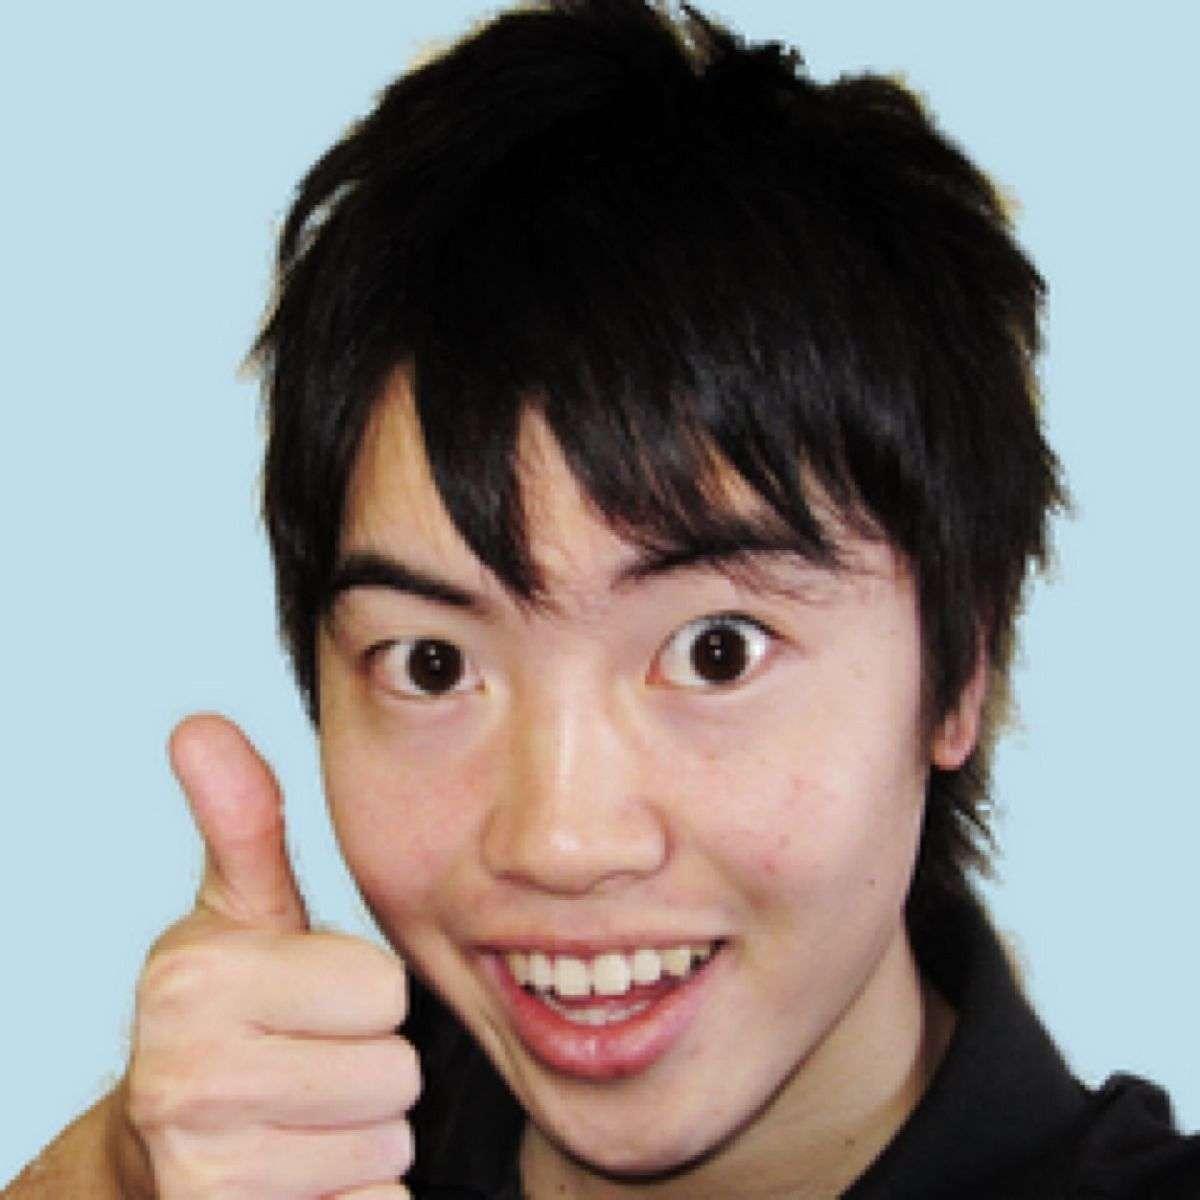 【Youtuber】MasuoTVの低評価が多いのはなぜ?調査してみた!【へぇ~私もやってみよ?】 - NAVER まとめ